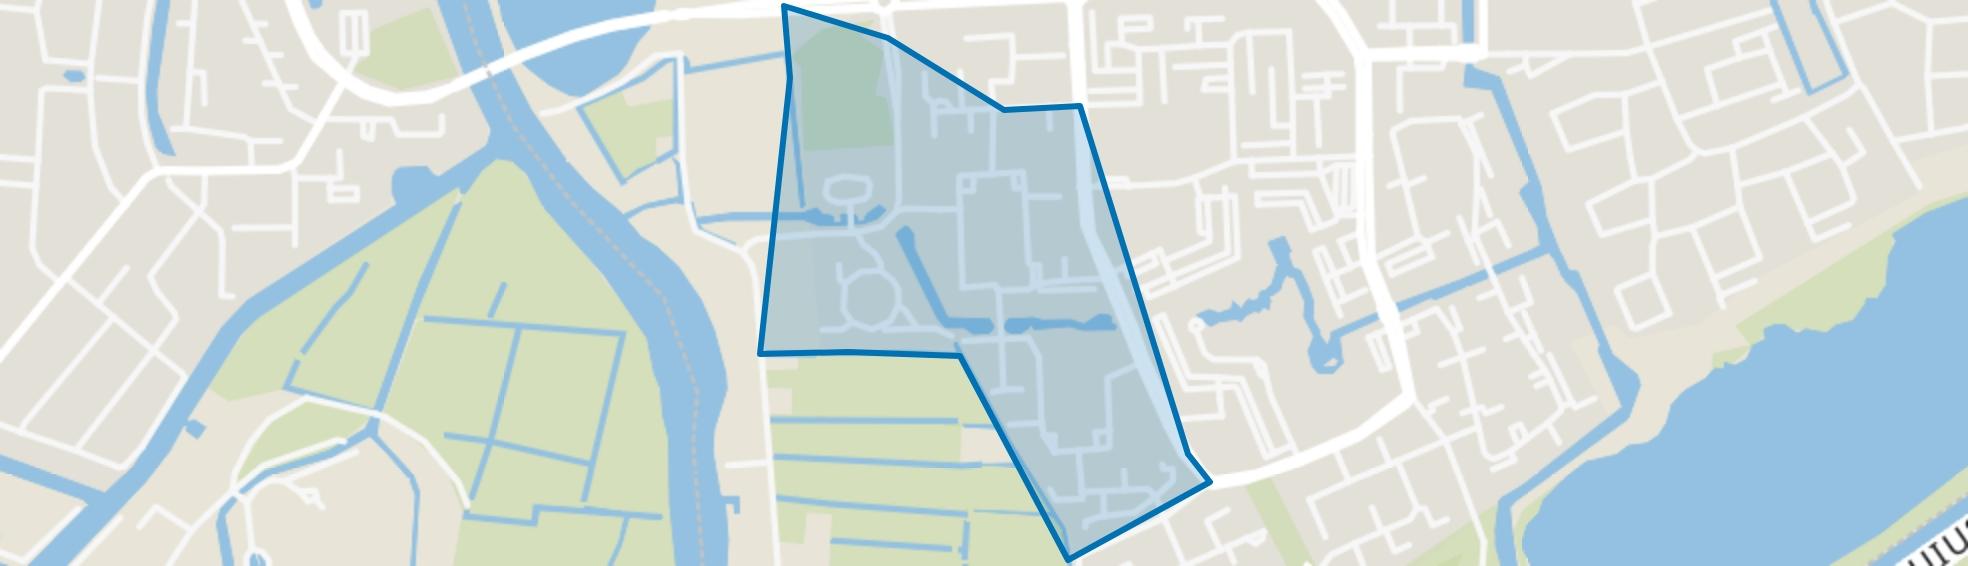 Hondsbos-Dever, Haarlem map